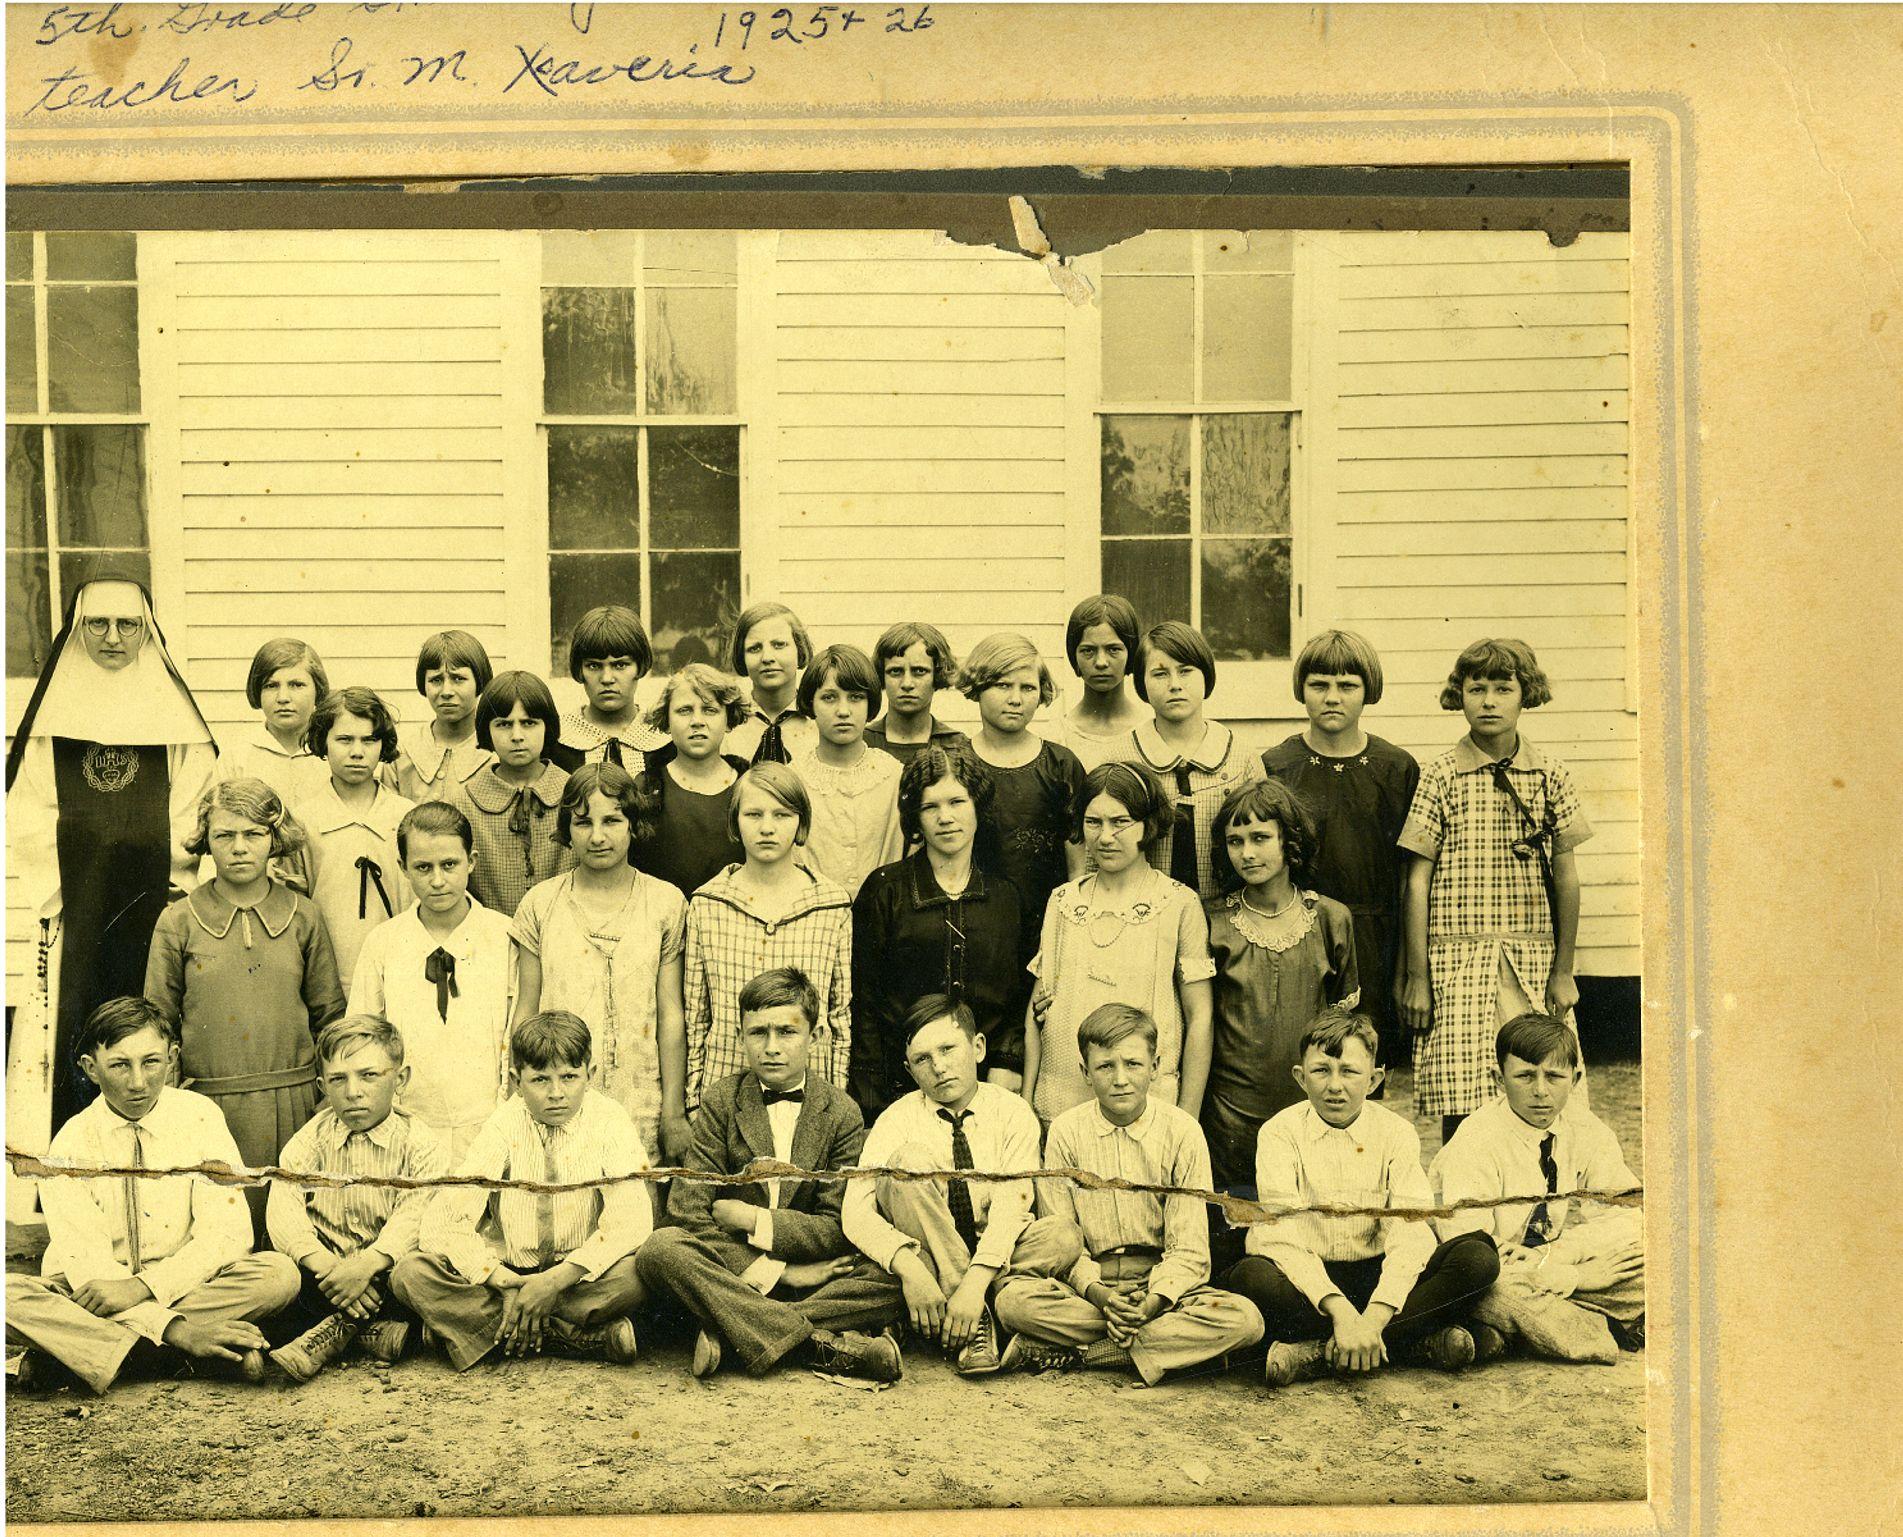 Helen Novak 1924  St Mary's School   5th grade second row from bottom - third from left